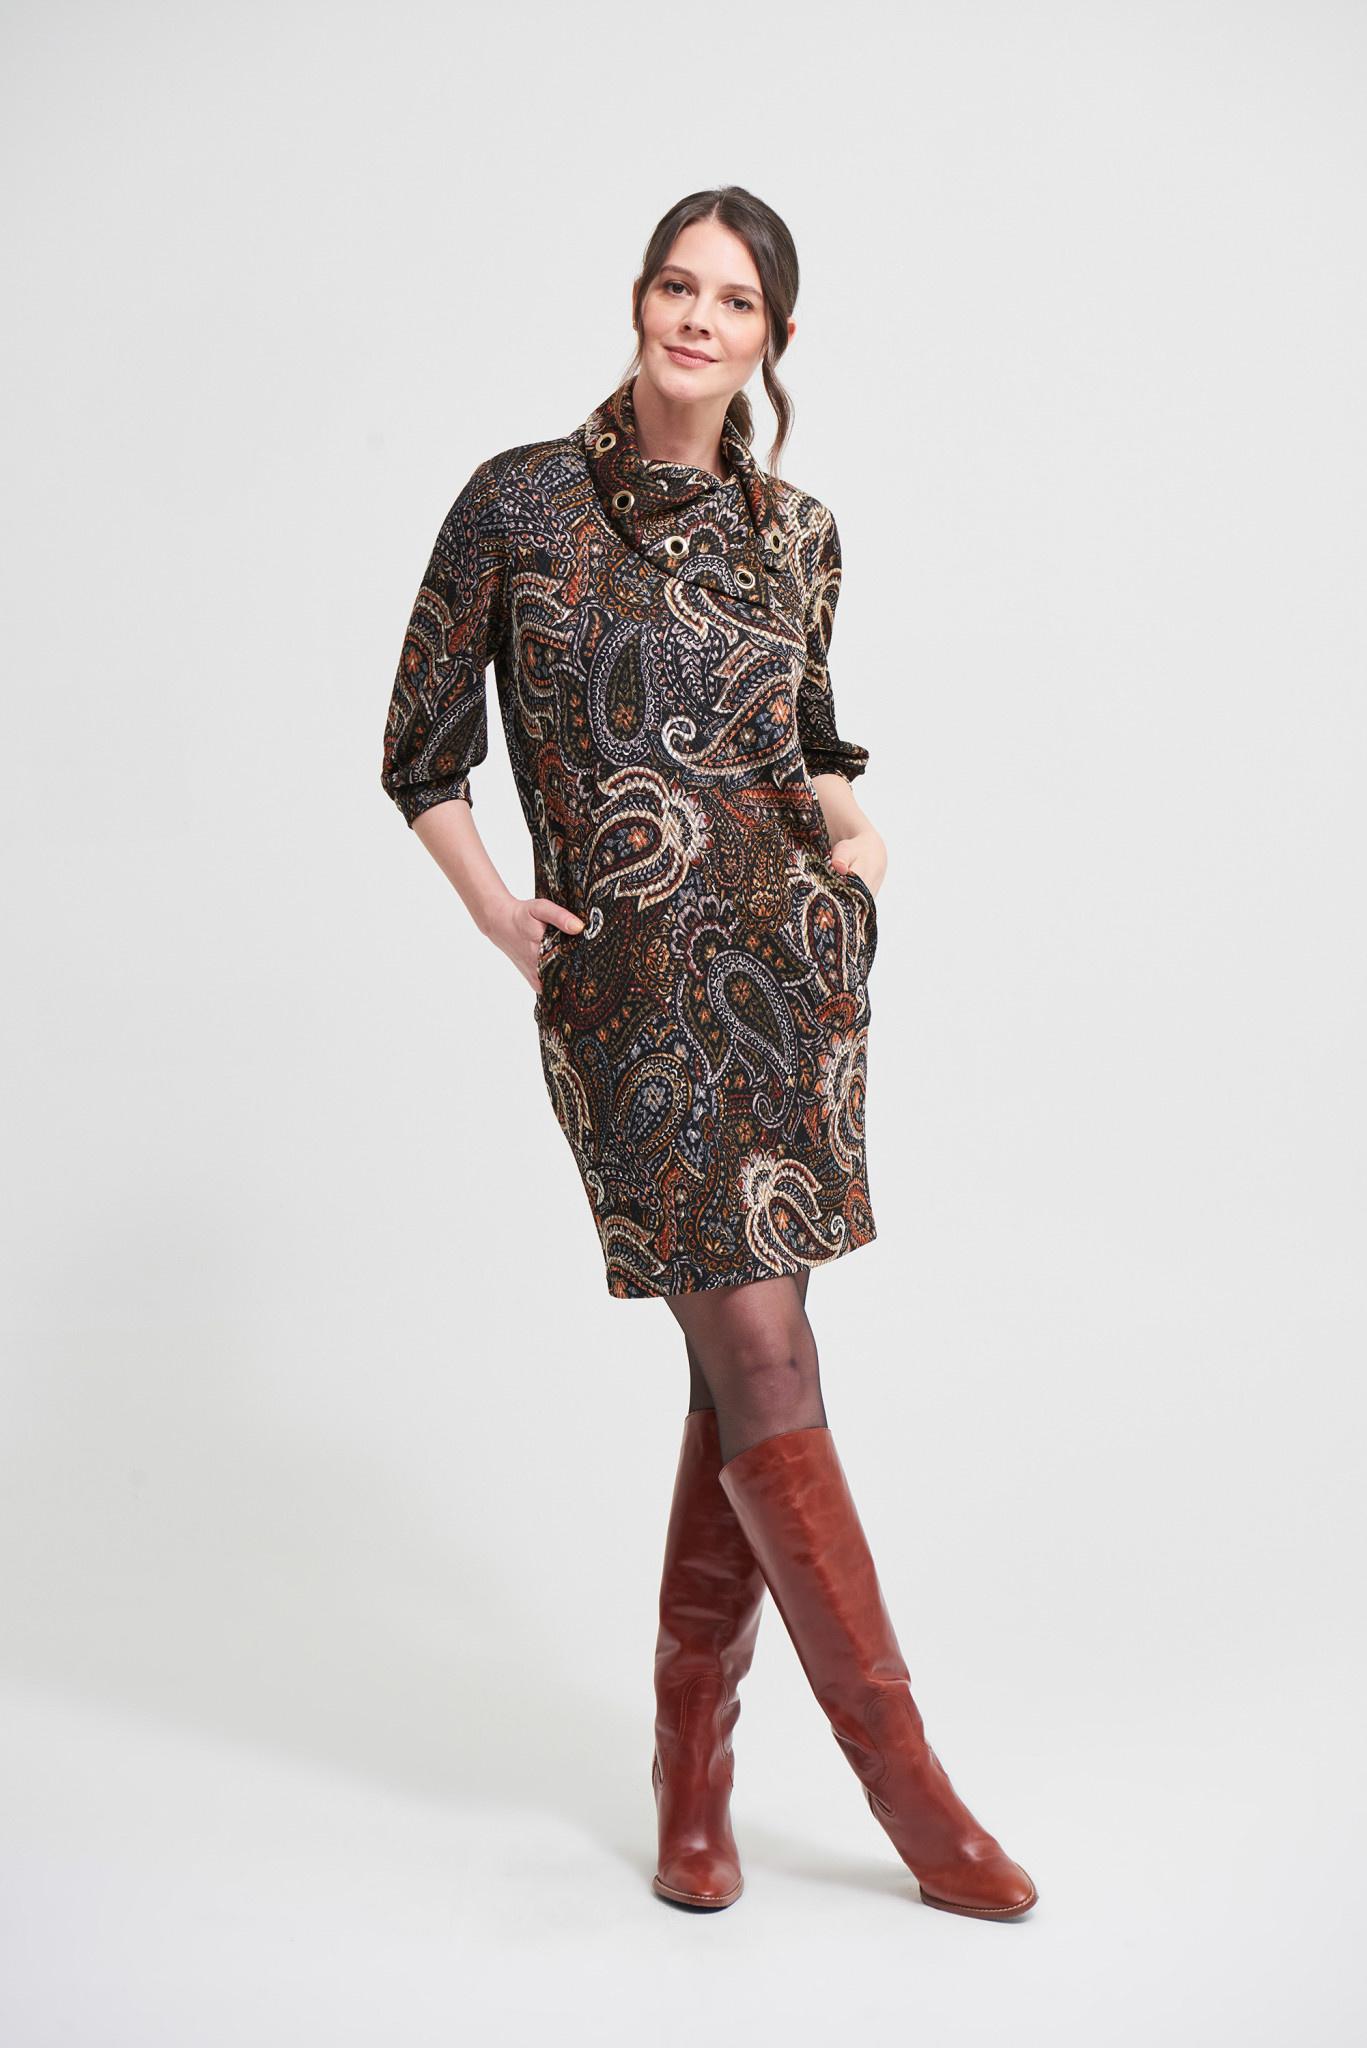 Autumn Paisley Dress with Grommet Detail